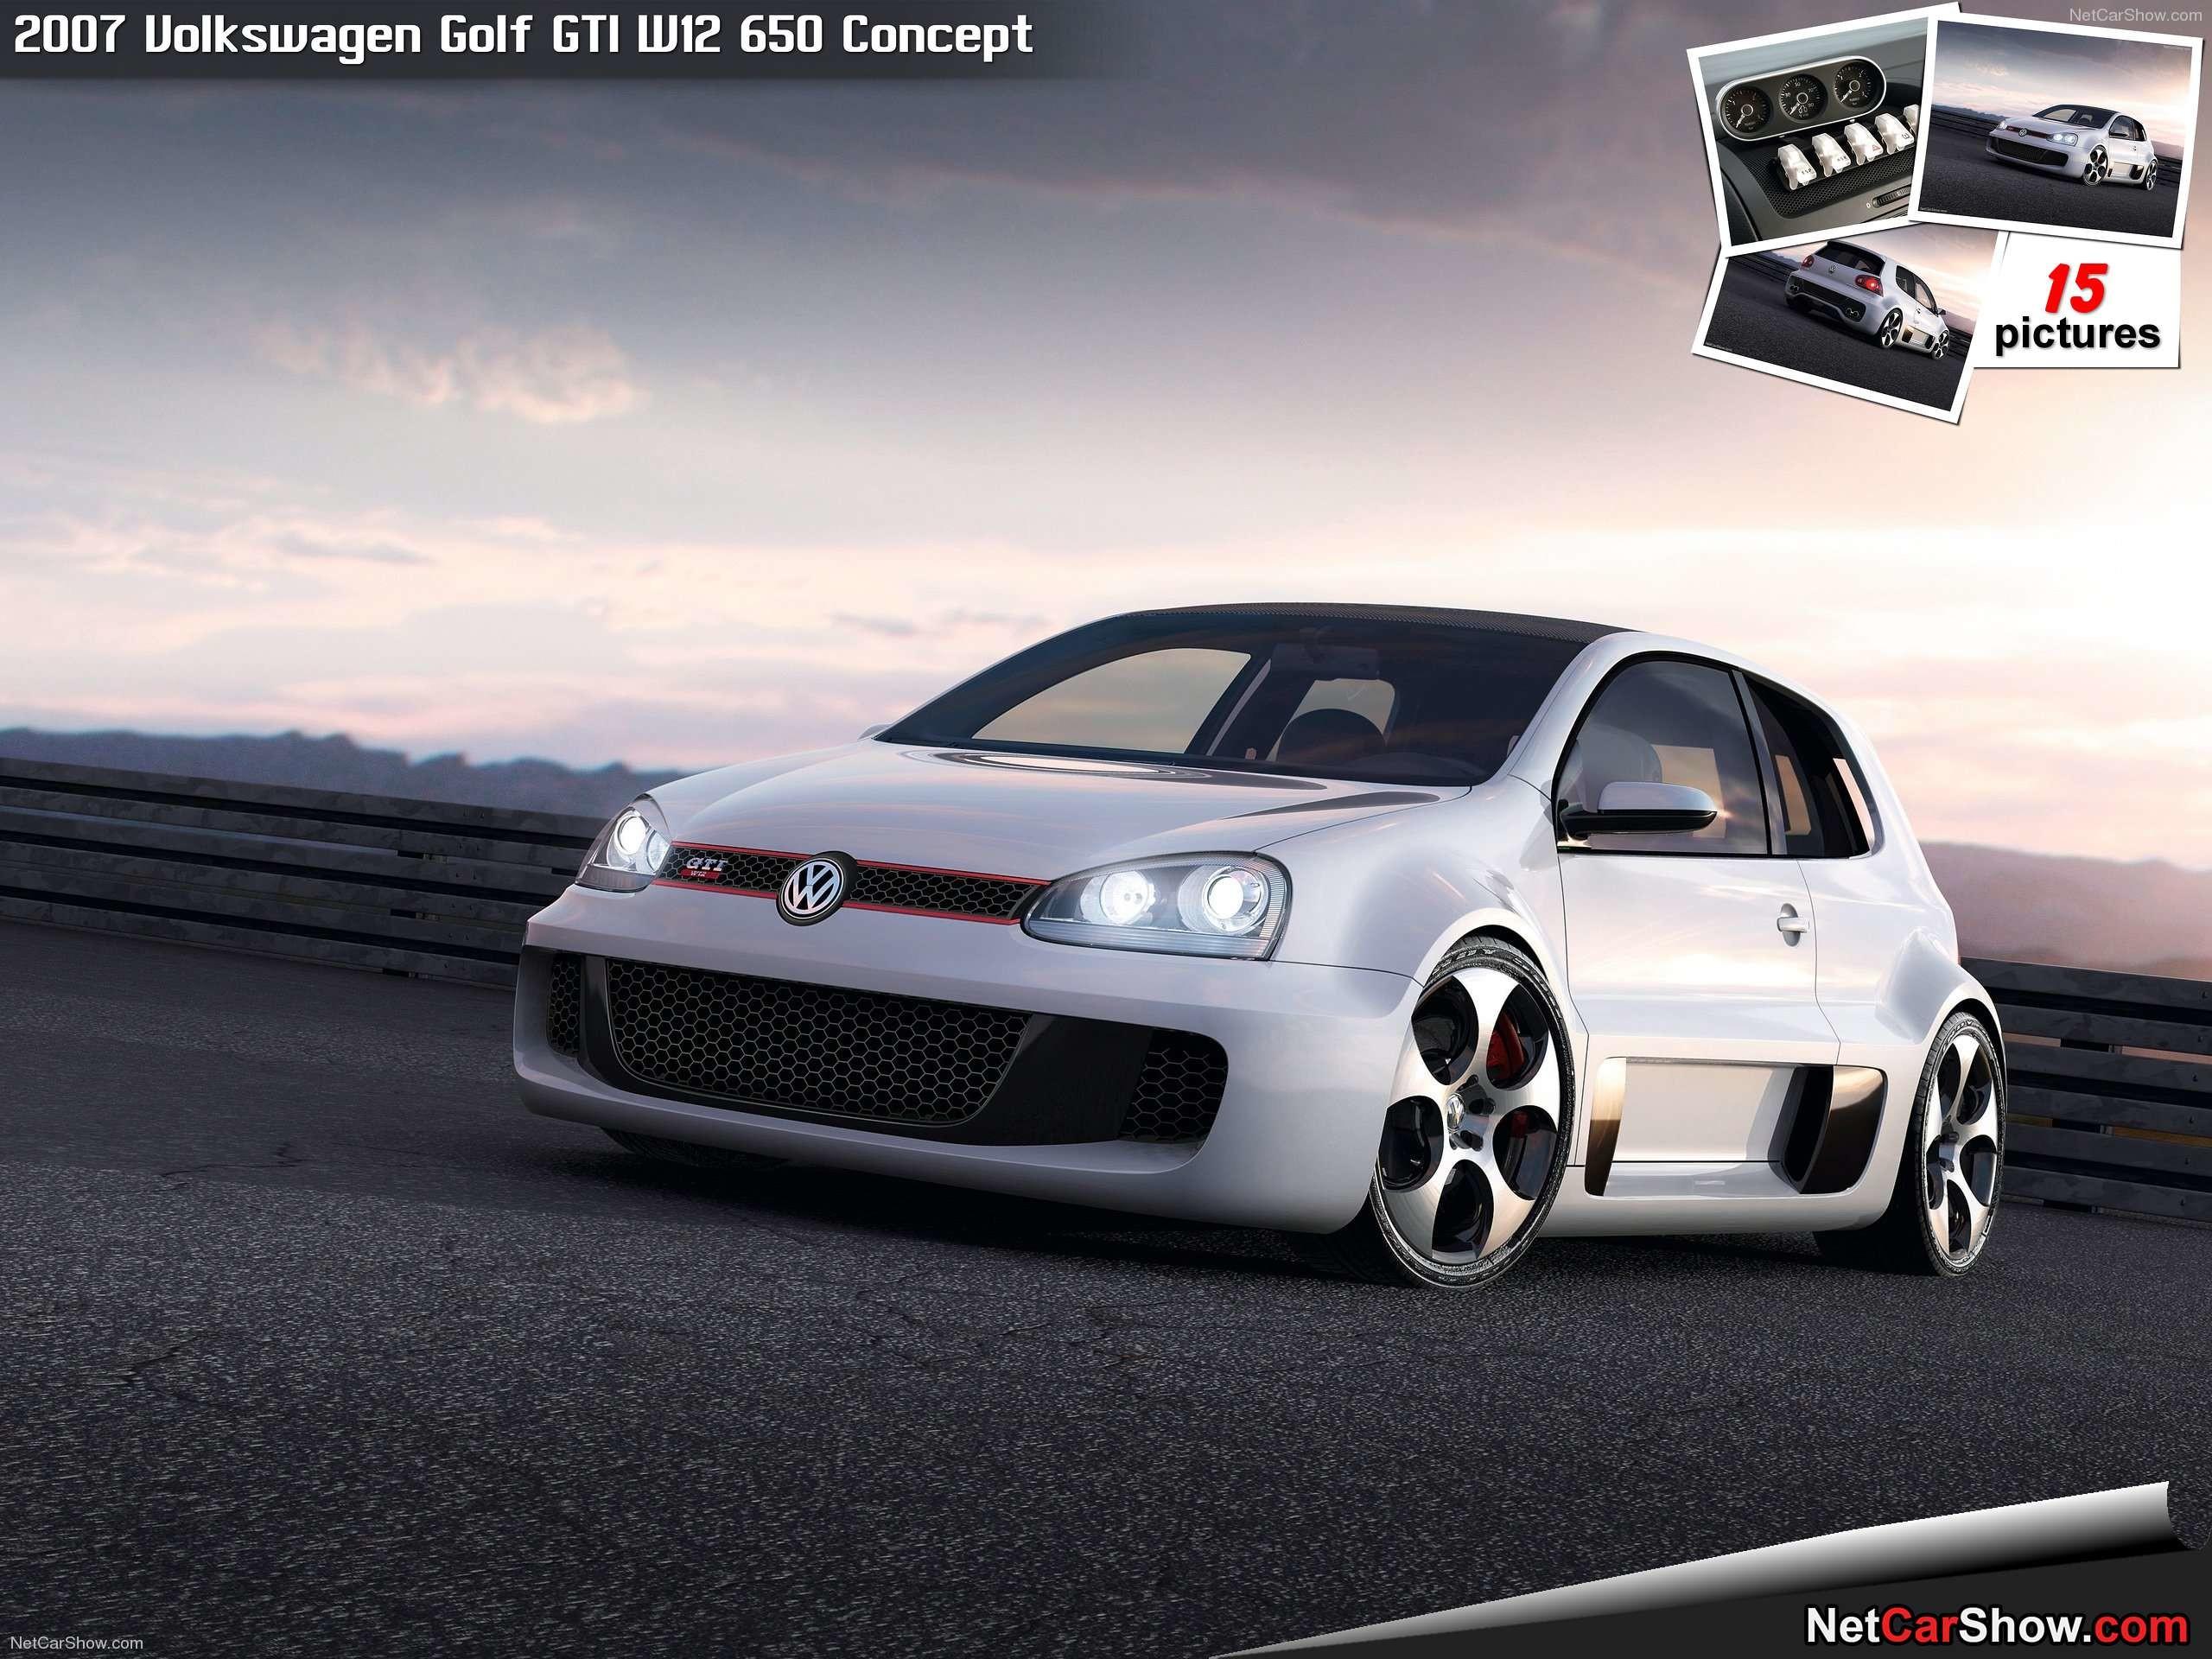 Res: 2560x1920, Volkswagen Golf GTI W12 650 Concept (2007)